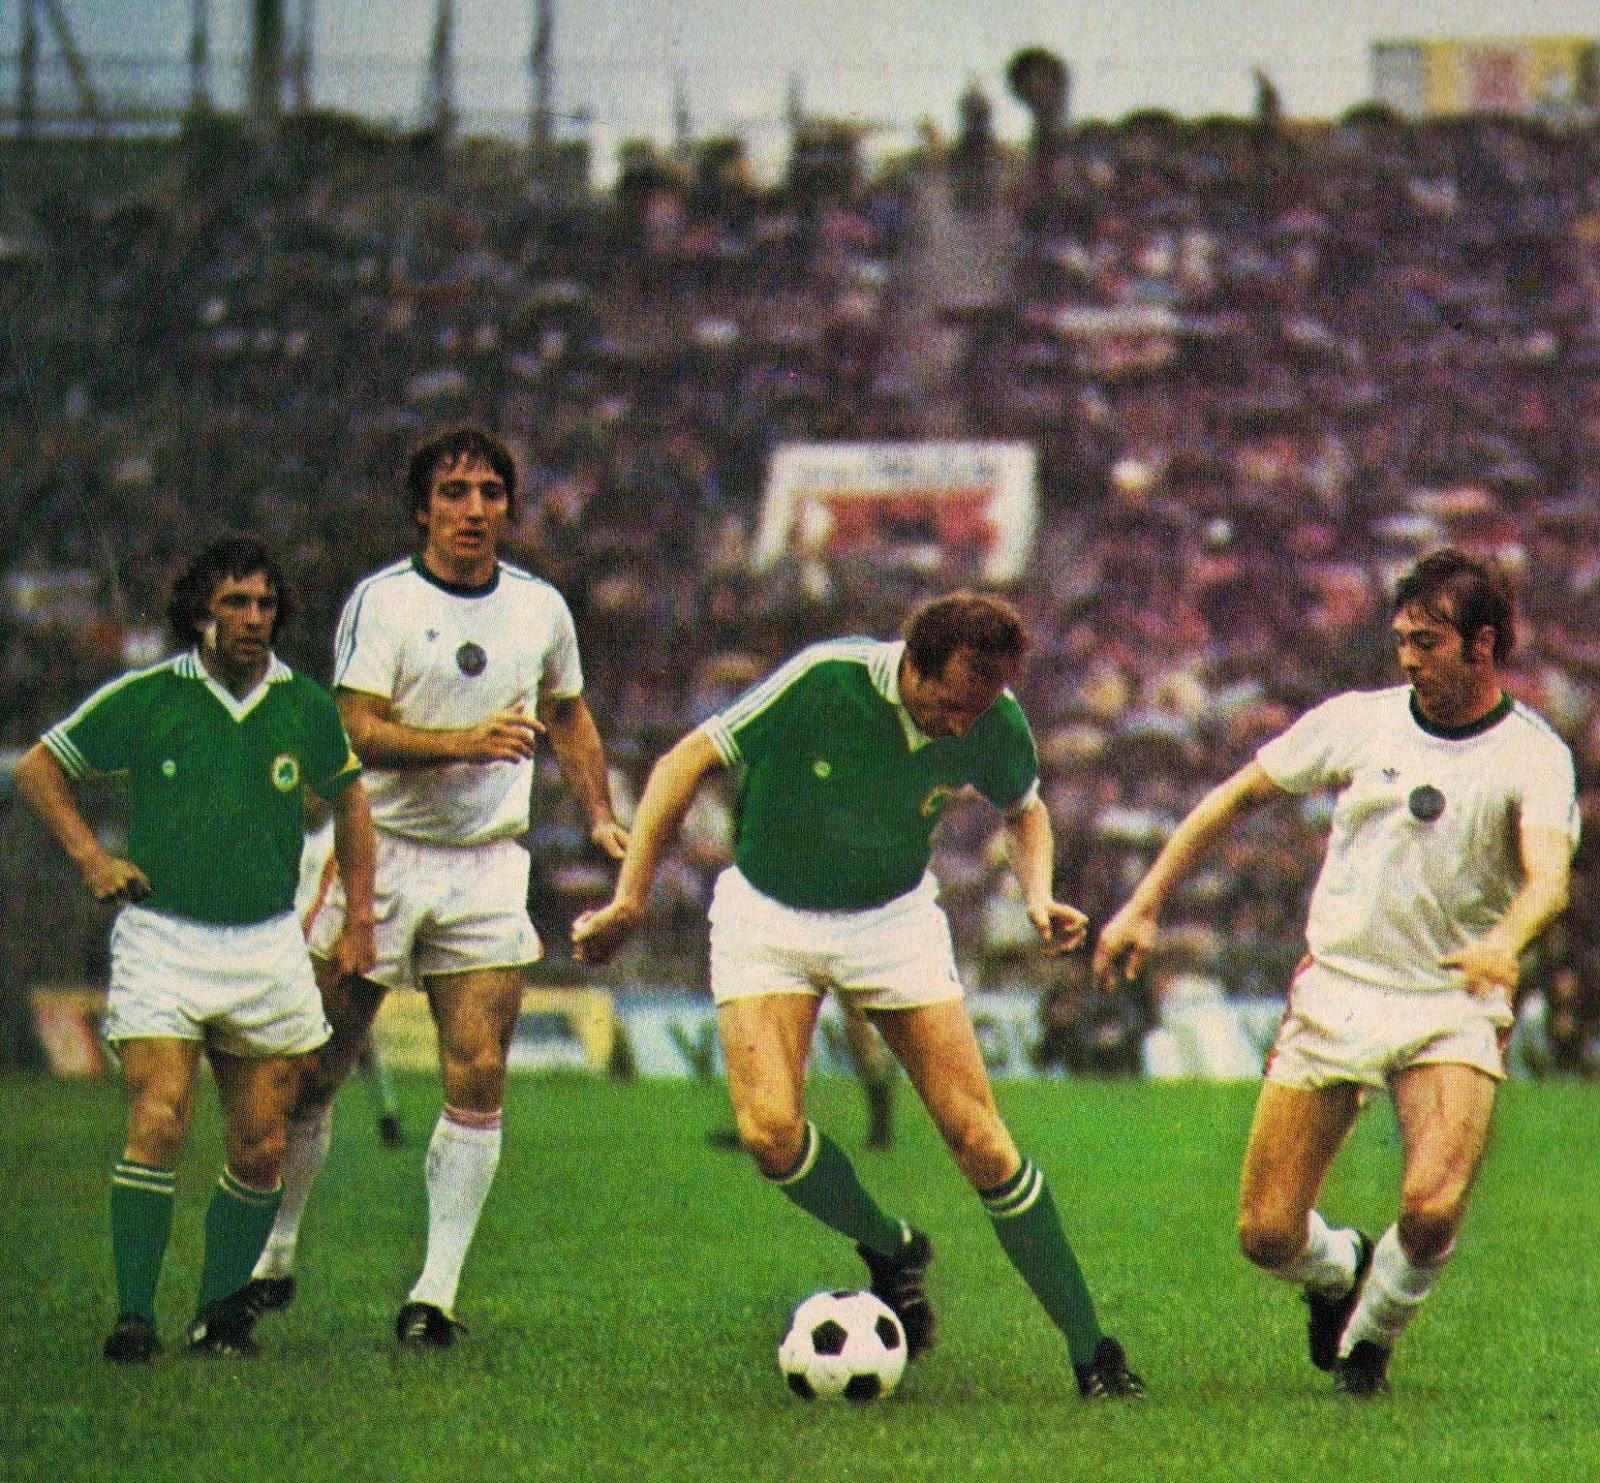 soccer nostalgia old match photographspart 31c